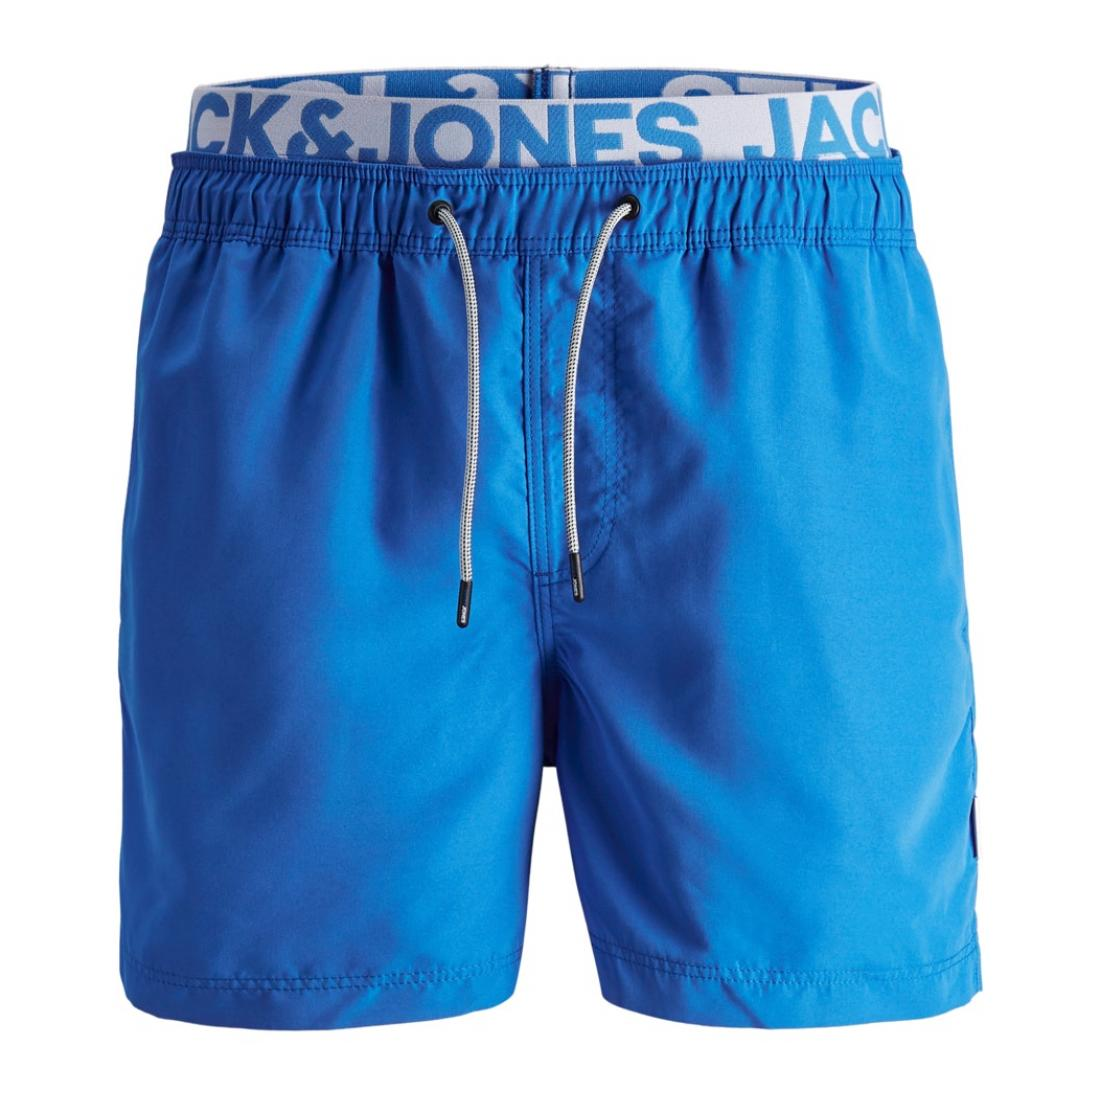 Jack & Jones Bermuda/Shorts Herren JJIARUBA JJSWIMSHORTS AKM